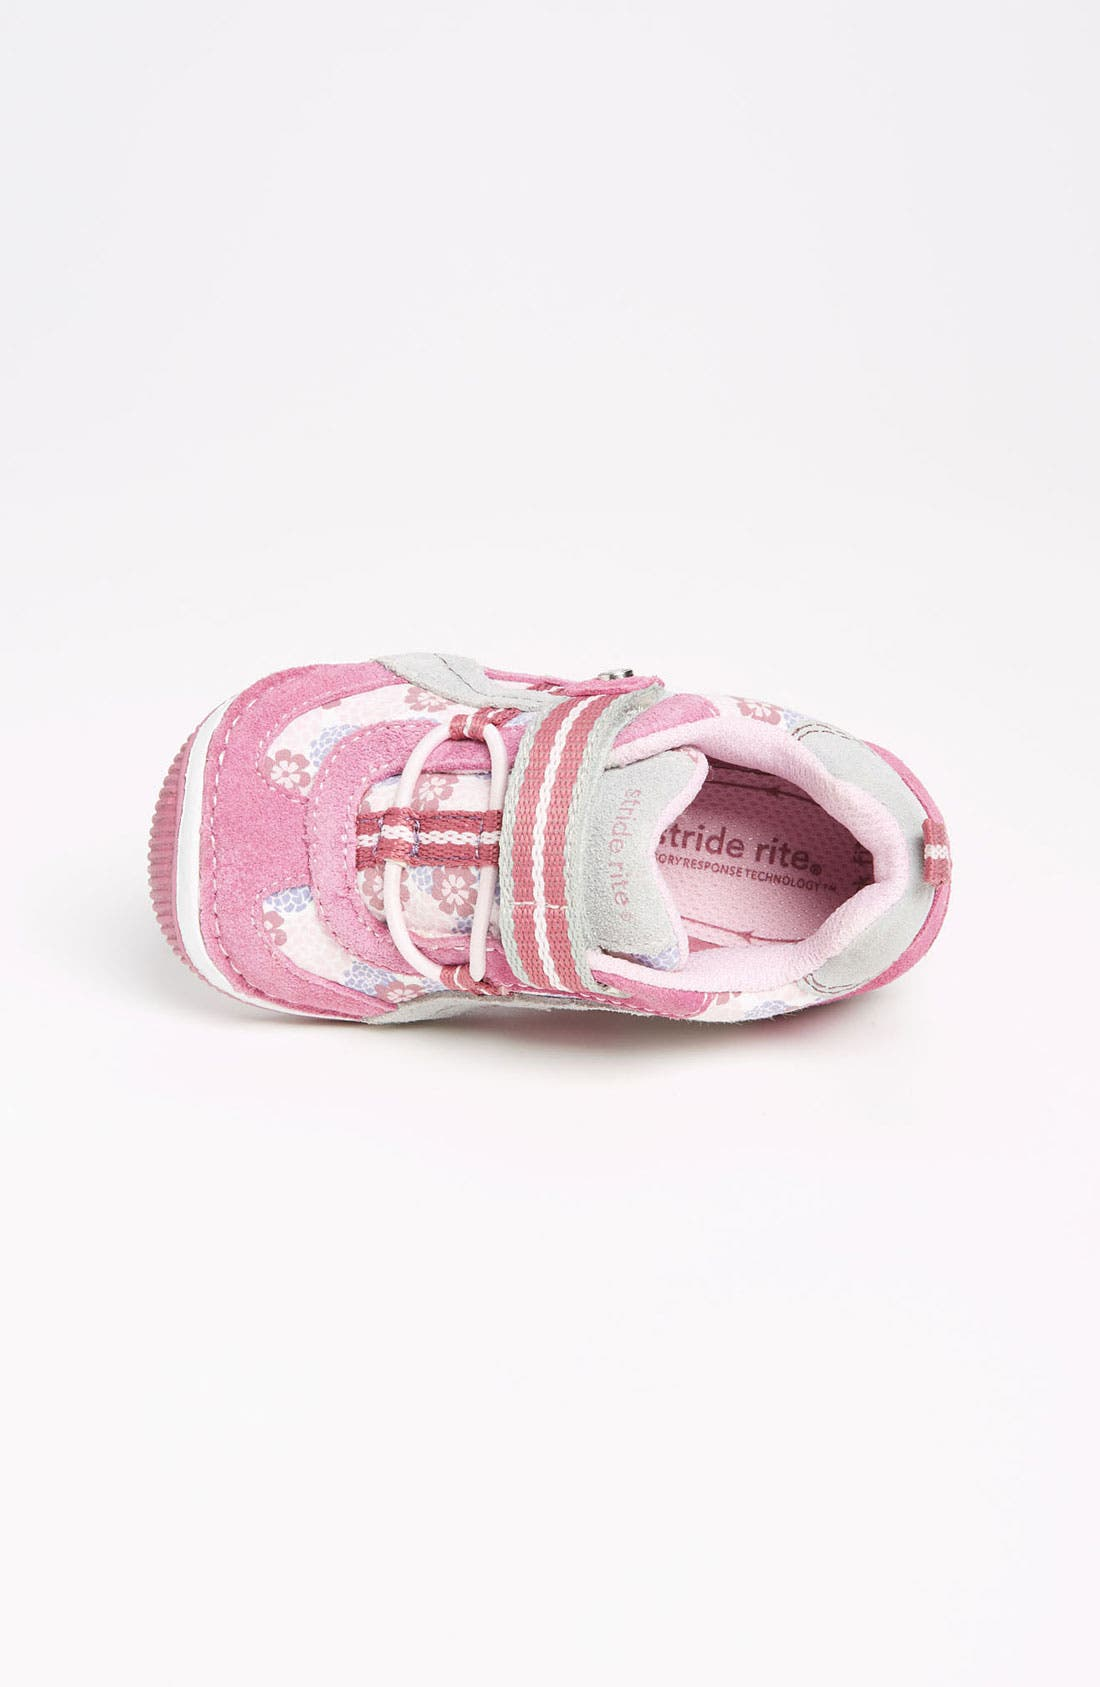 Alternate Image 3  - Stride Rite 'Maive' Sneaker (Baby, Walker & Toddler)